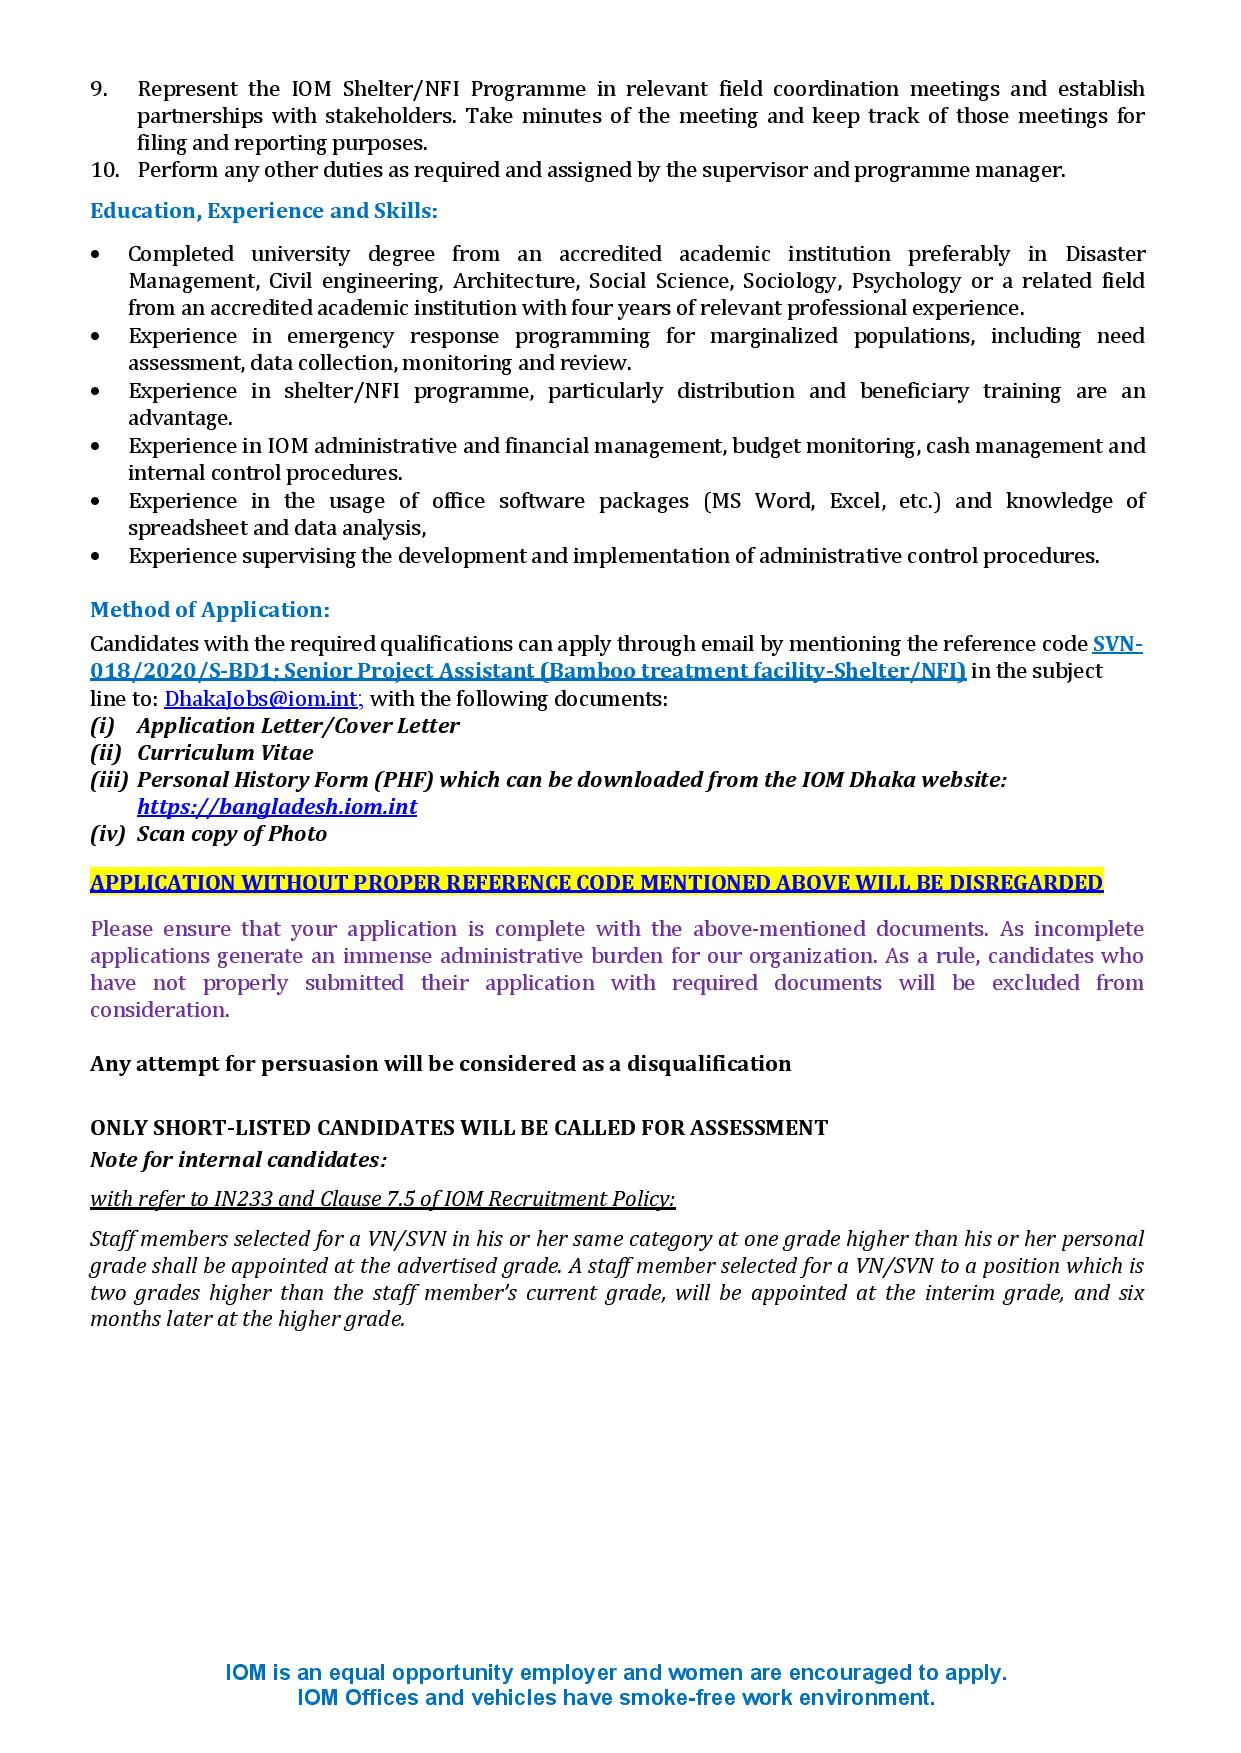 International Organization for Migration Job Circular 2020